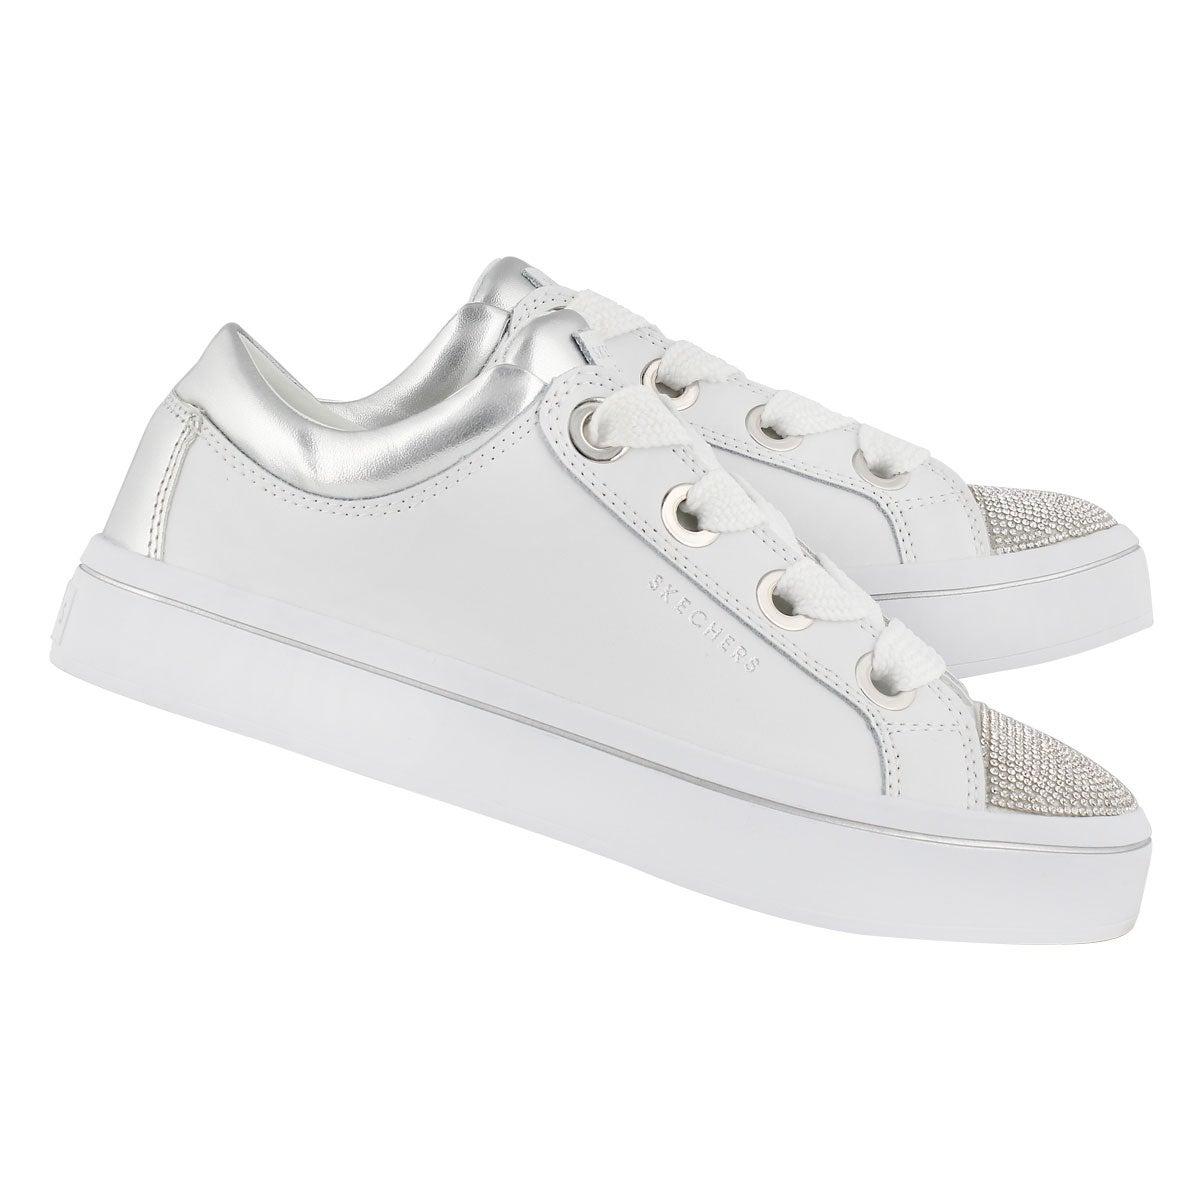 Lds Hi-Lites wht/slvr lace up sneaker